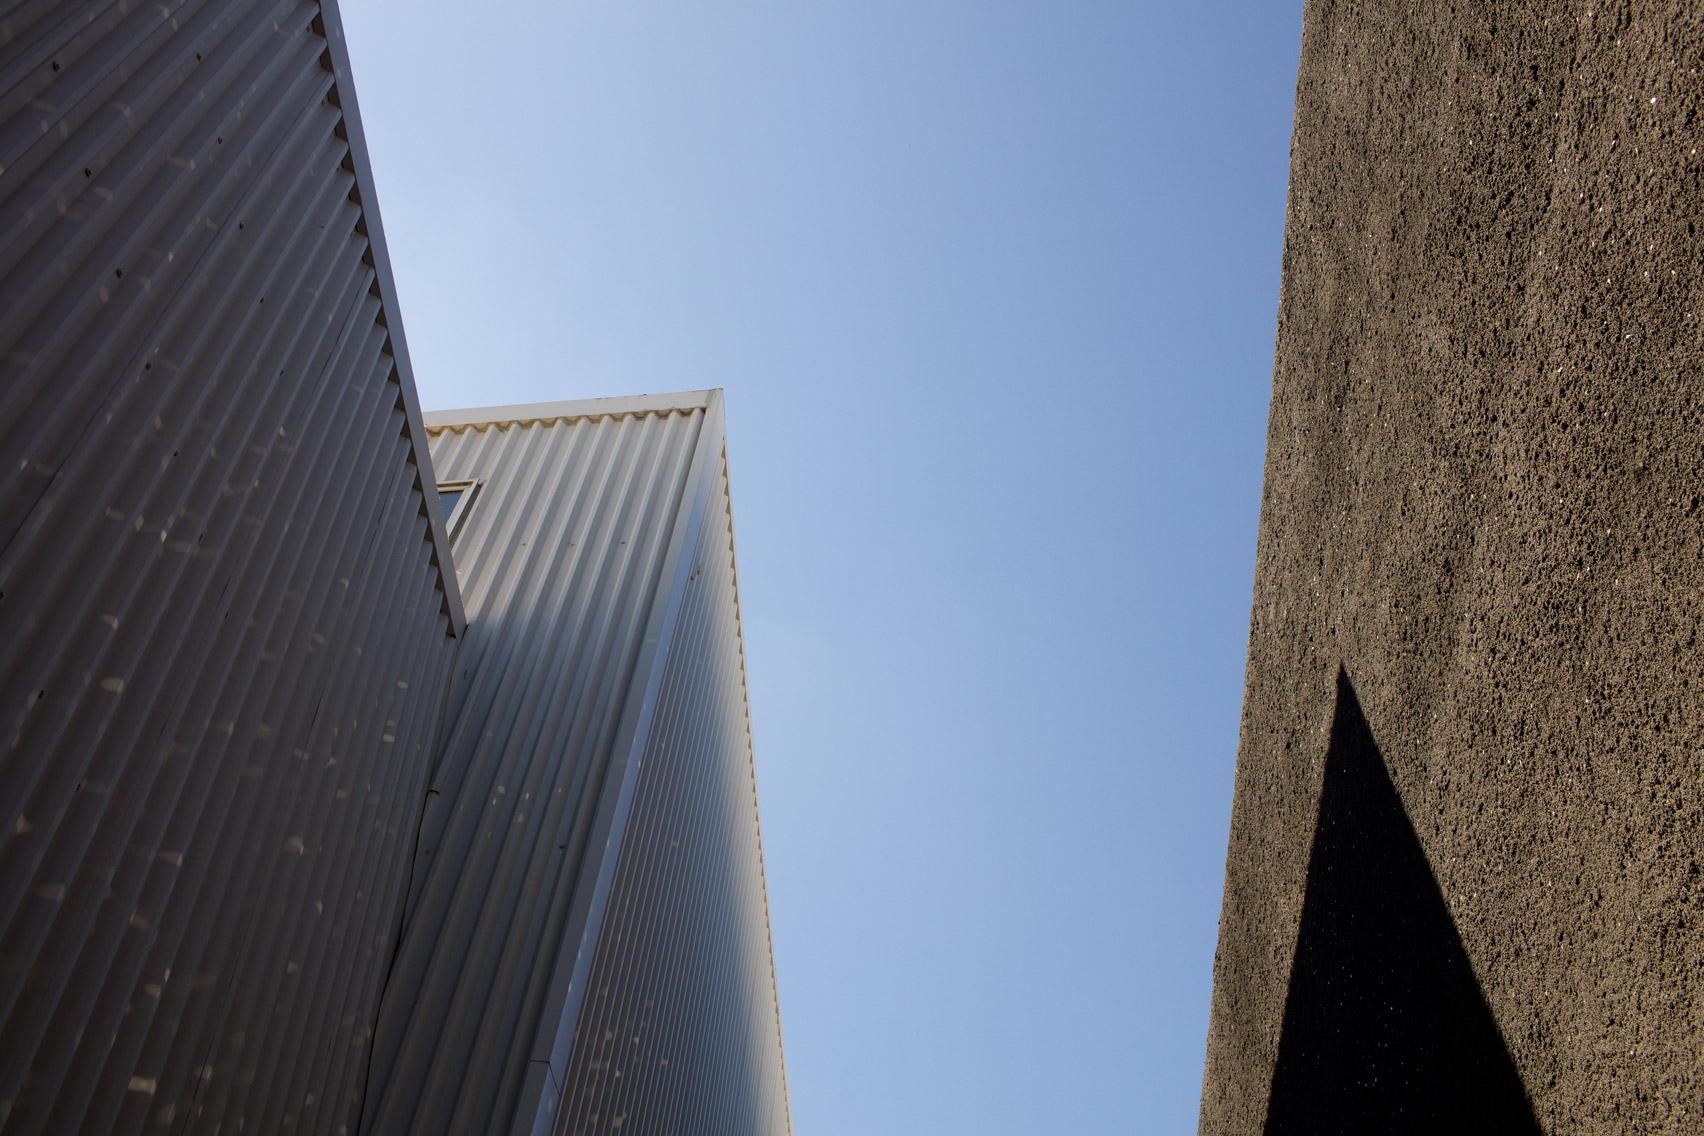 Galeria concrete obra del estudio oma en dubai